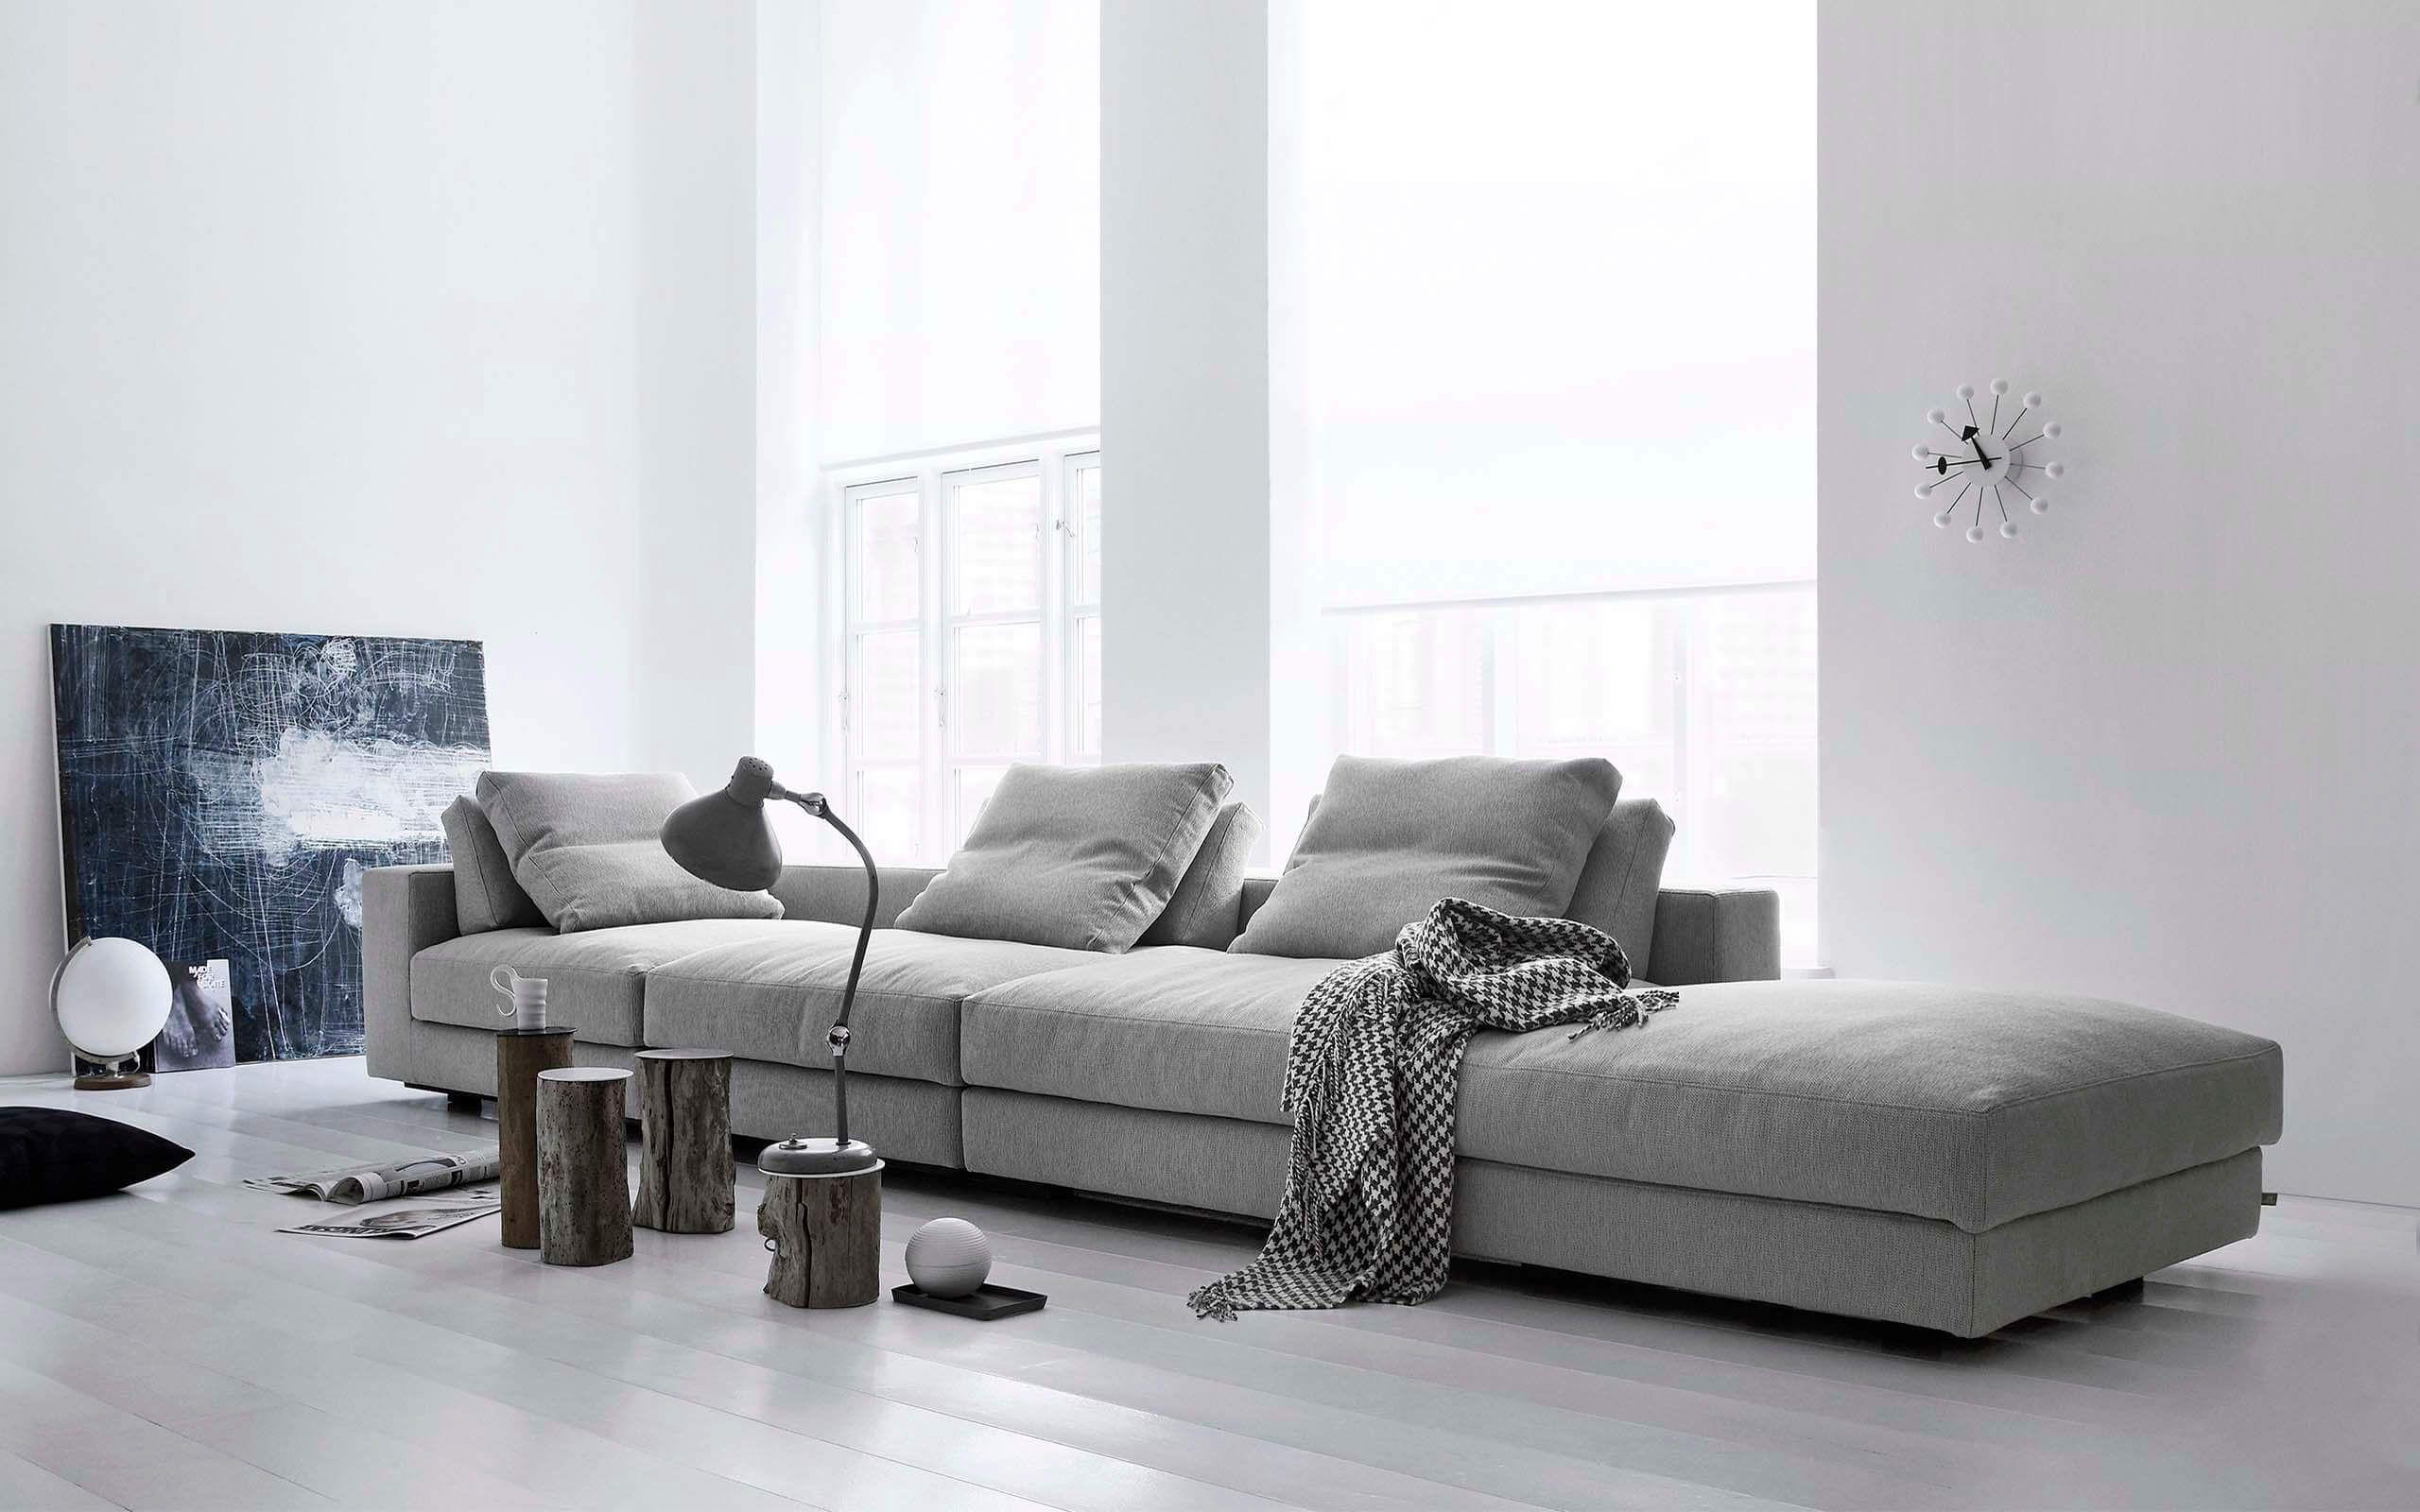 Jens Juul Eilersen Sofas   EILERSEN   Modular sofa, Camerich